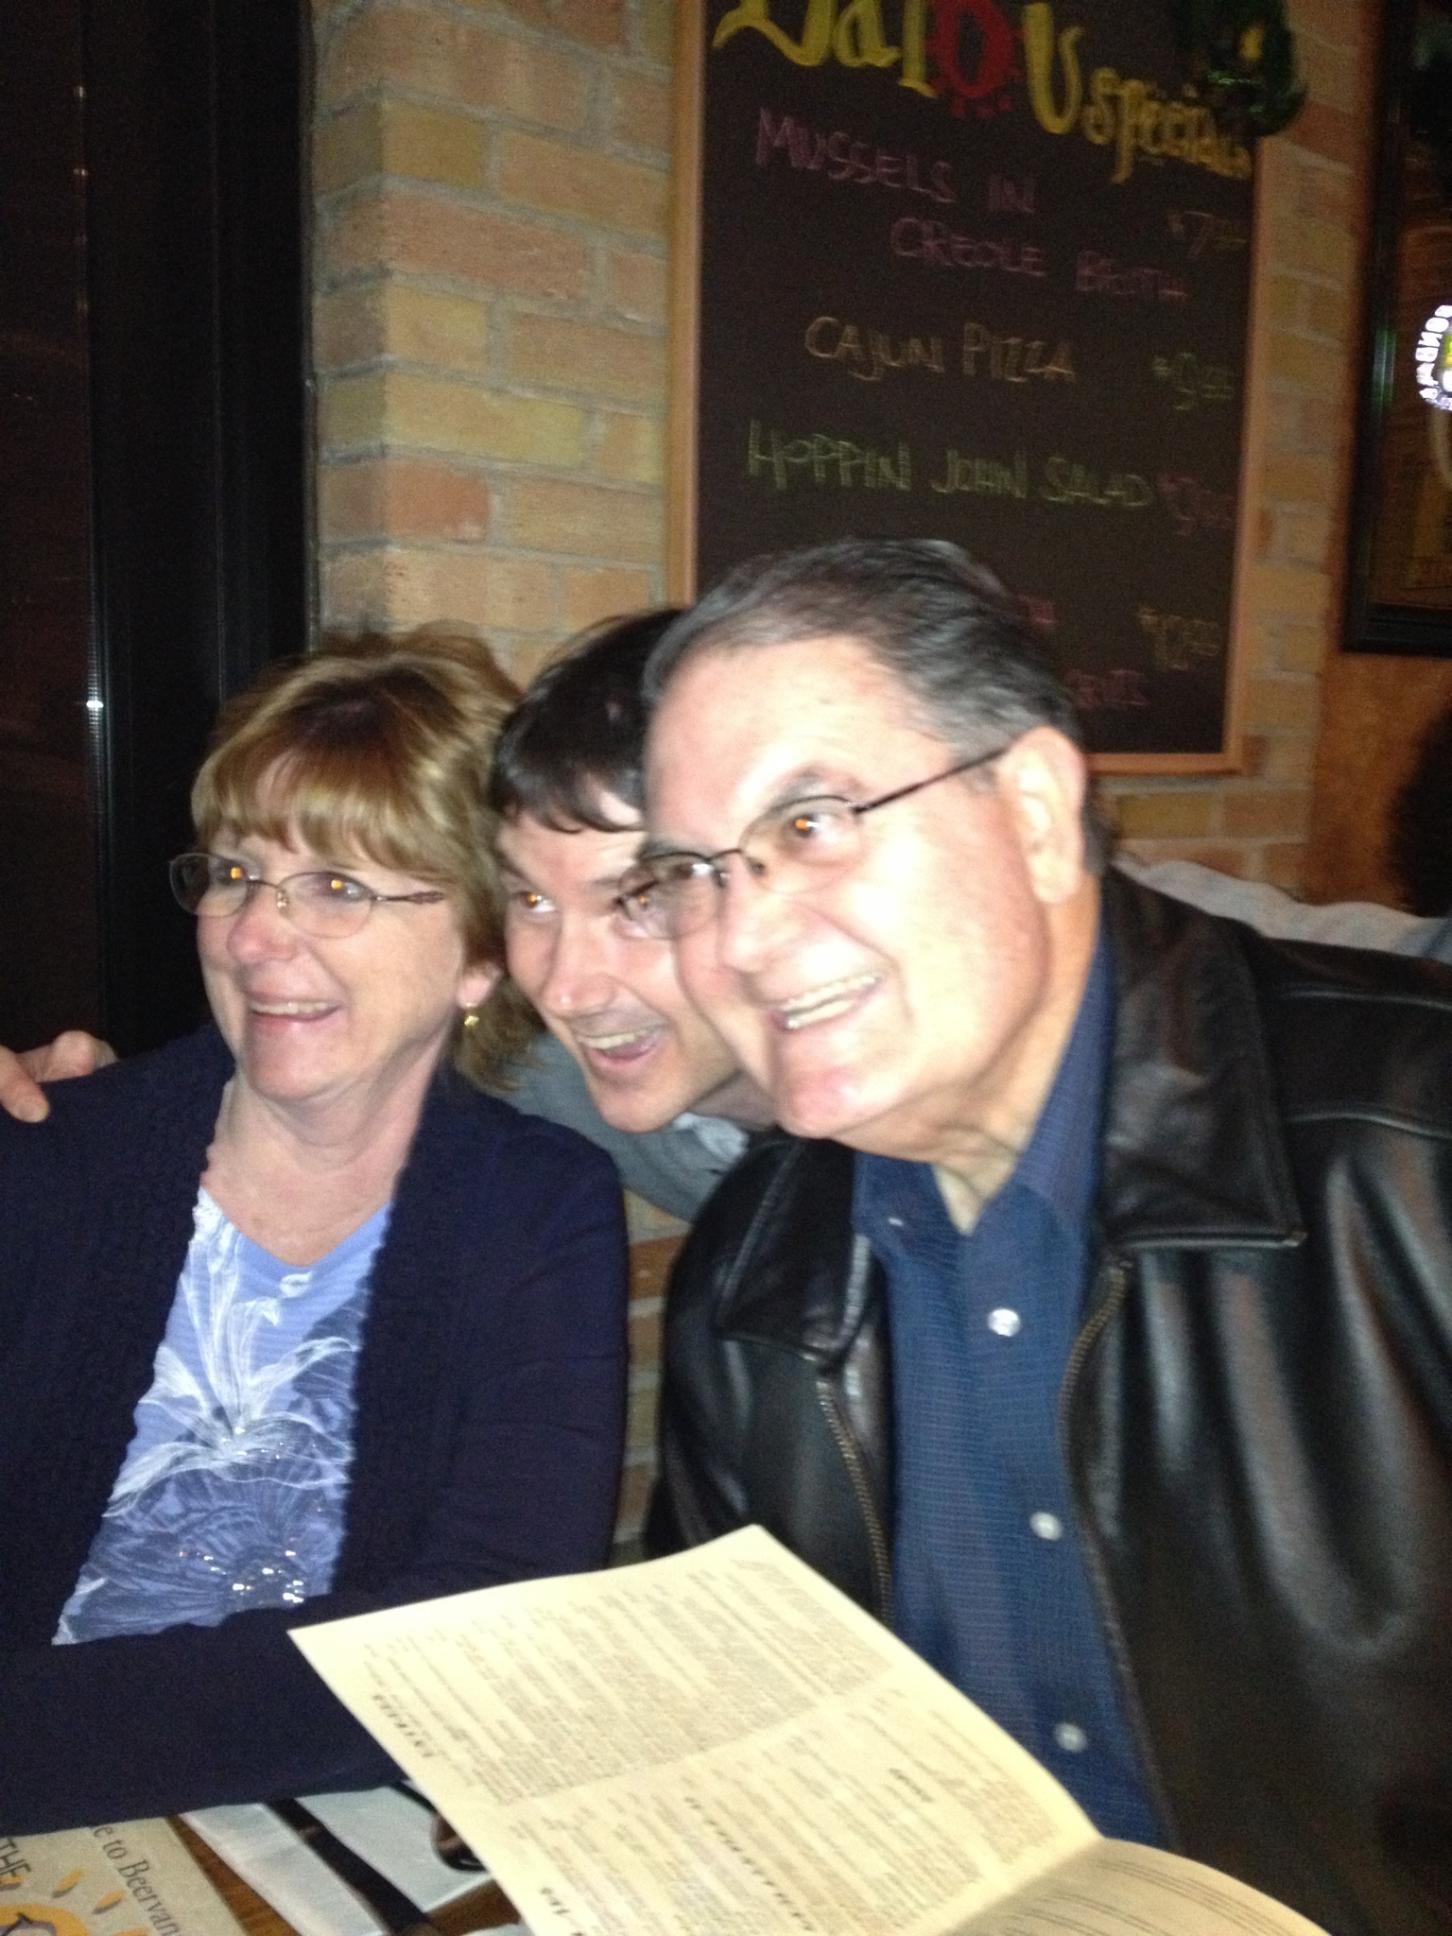 Dad's 70th Birthday Surprise Feb 8, 2013 59